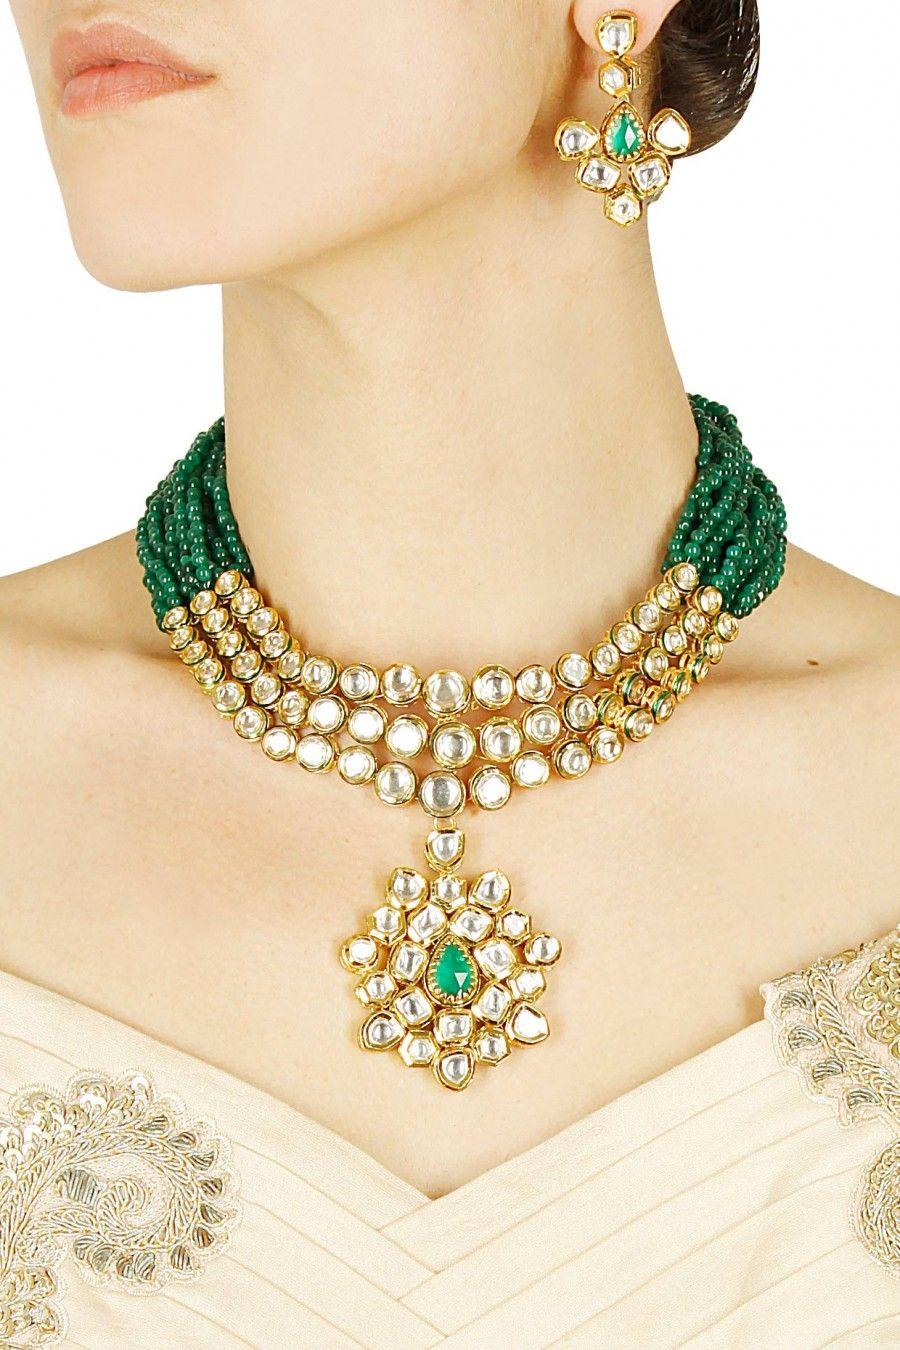 Anjali Jain | jewelery 2 | Pinterest | Jewel, Indian jewelry and ...